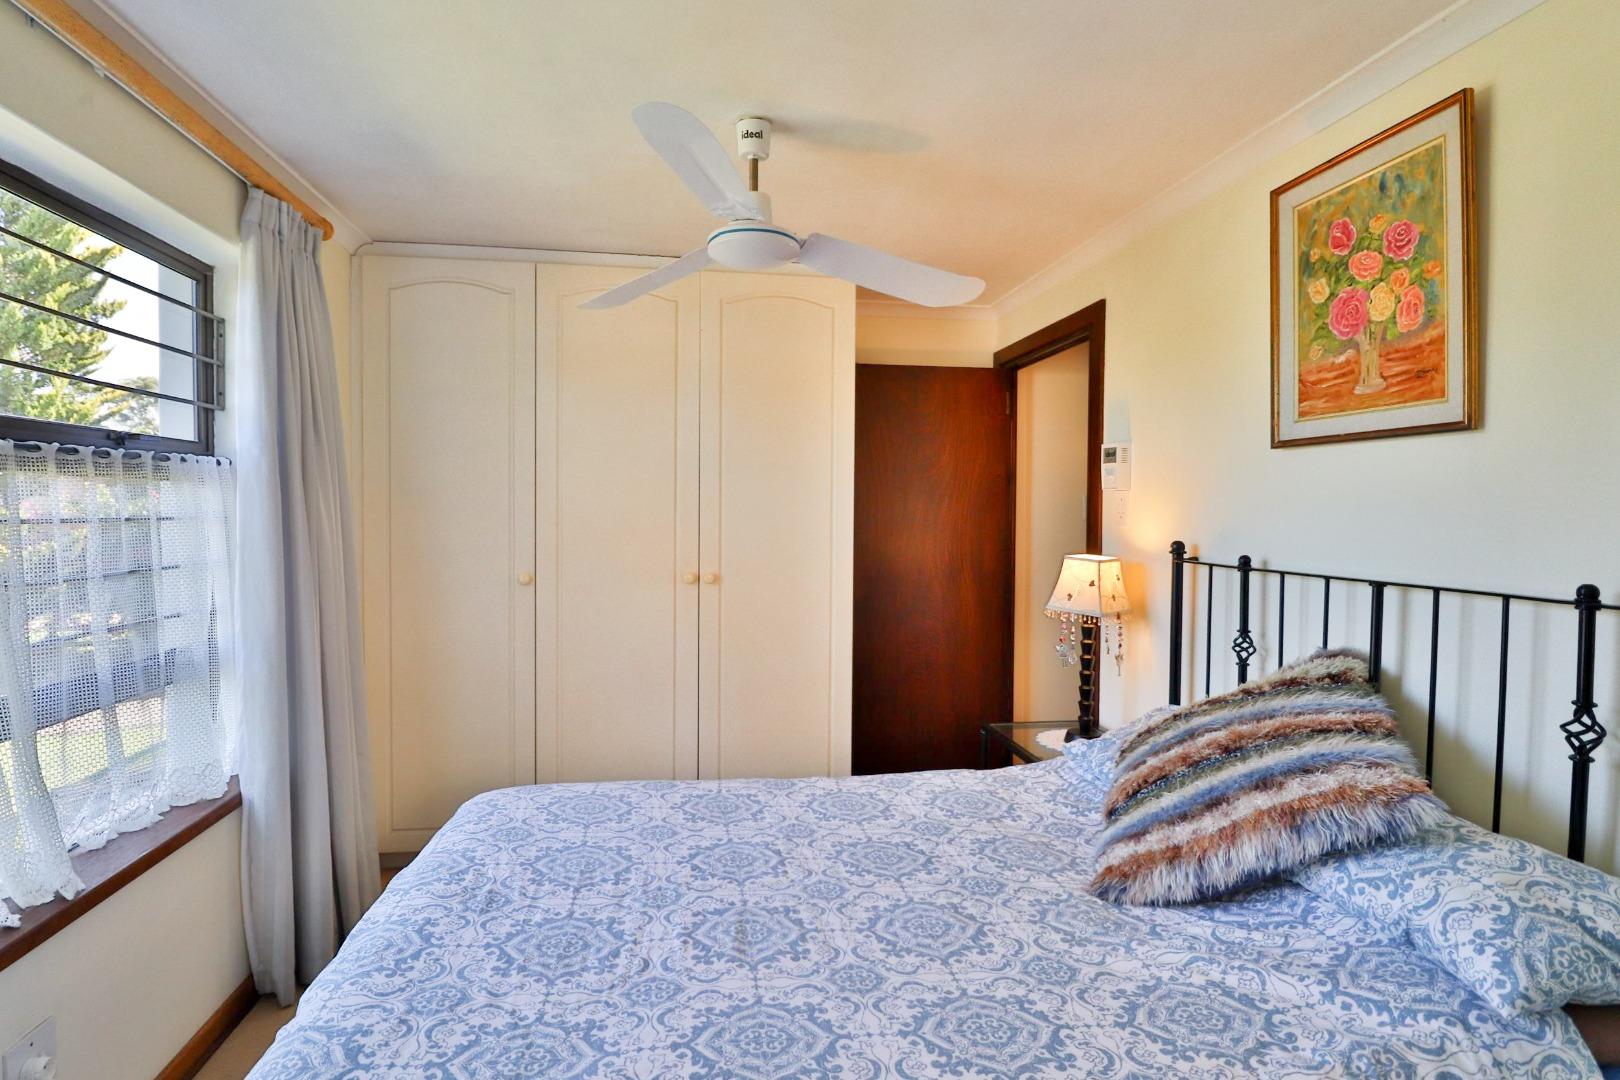 3 Bedroom House For Sale in Costa Sarda